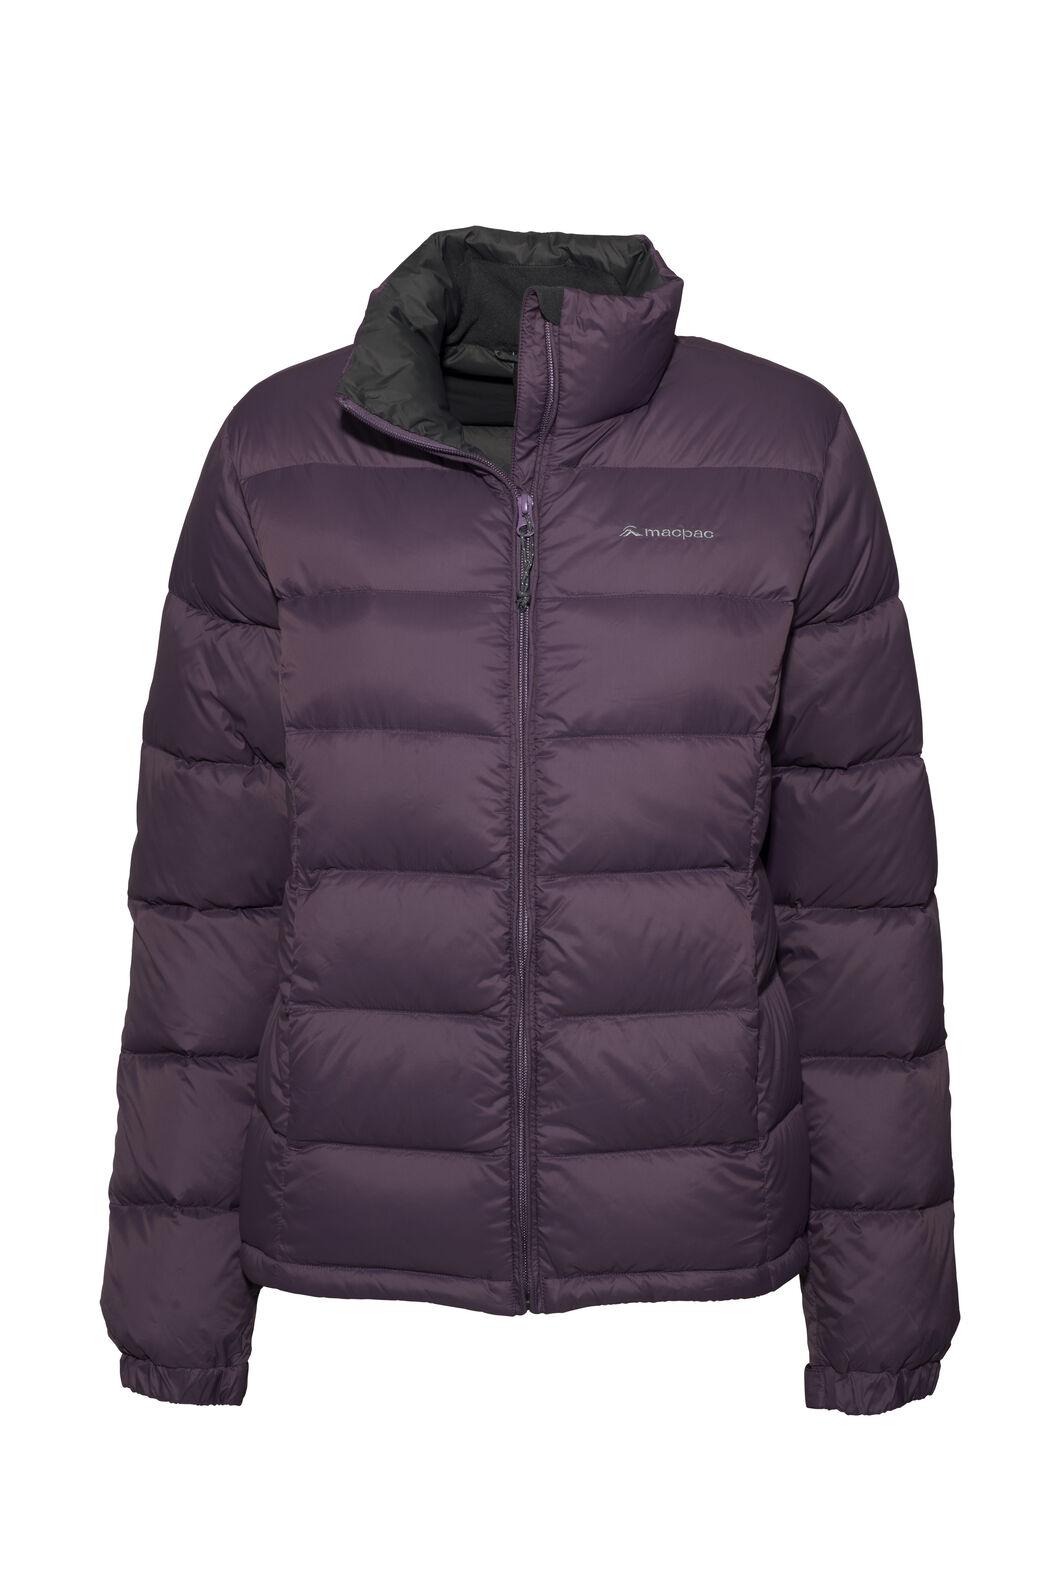 Macpac Halo Down Jacket — Women's, Vintage Violet, hi-res